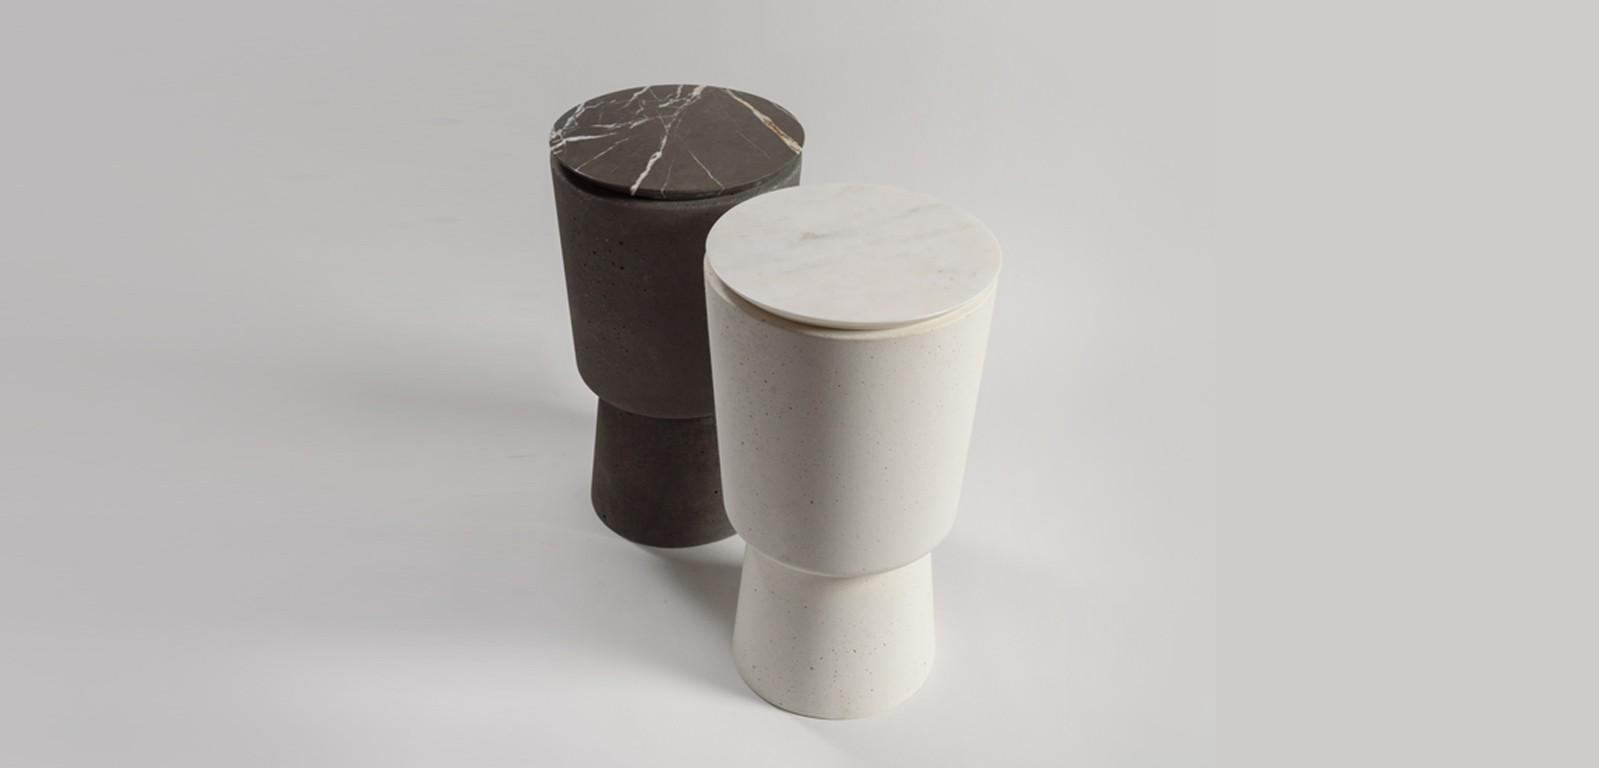 PLINTH-MARBLE-side-accent-tables-concrete-white-black-handmade-minimal